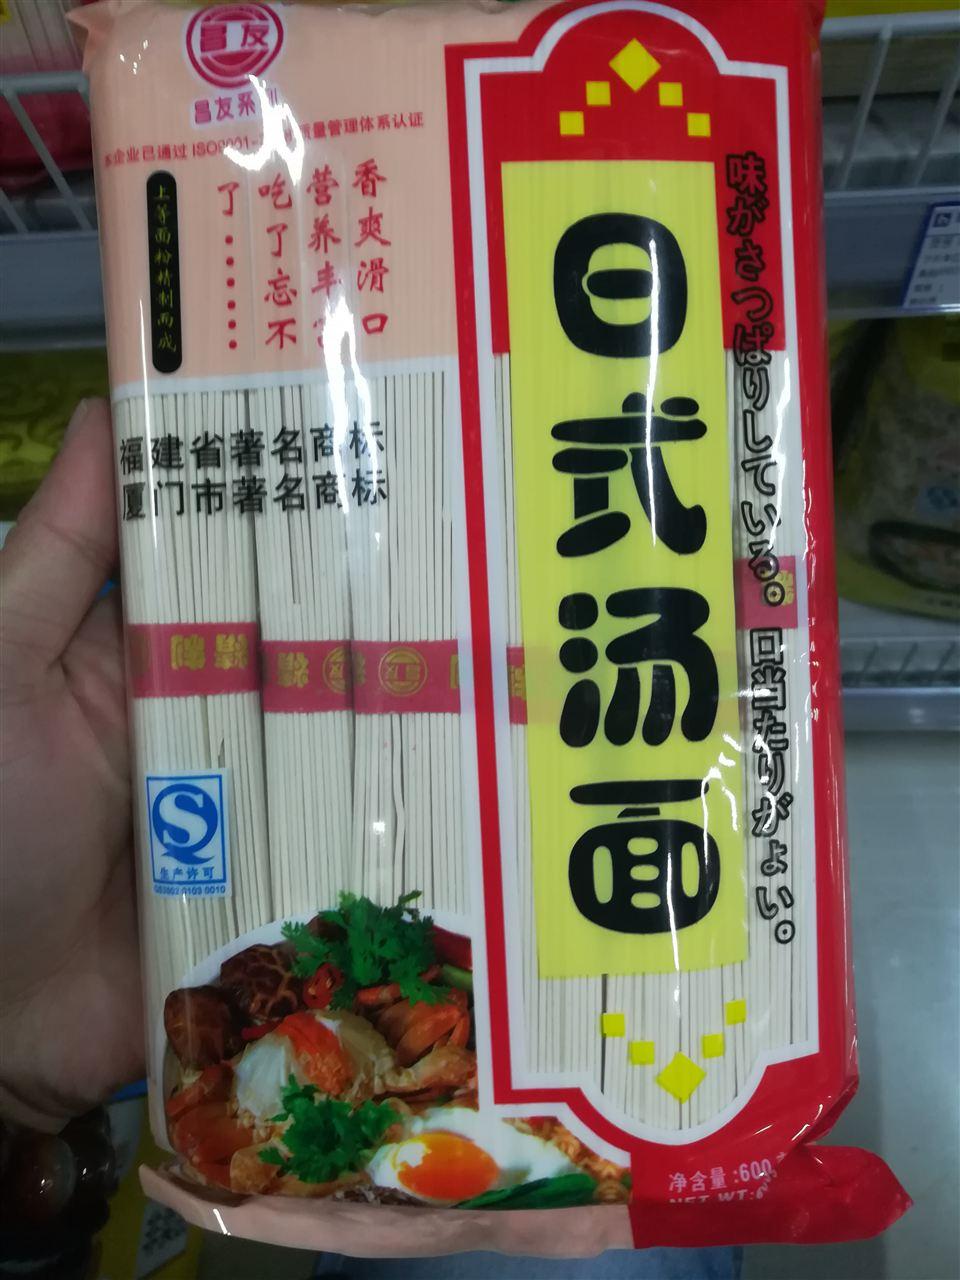 <strong>日式汤面自动包装机 厦门著名商标日式汤面卧式包装机</strong>